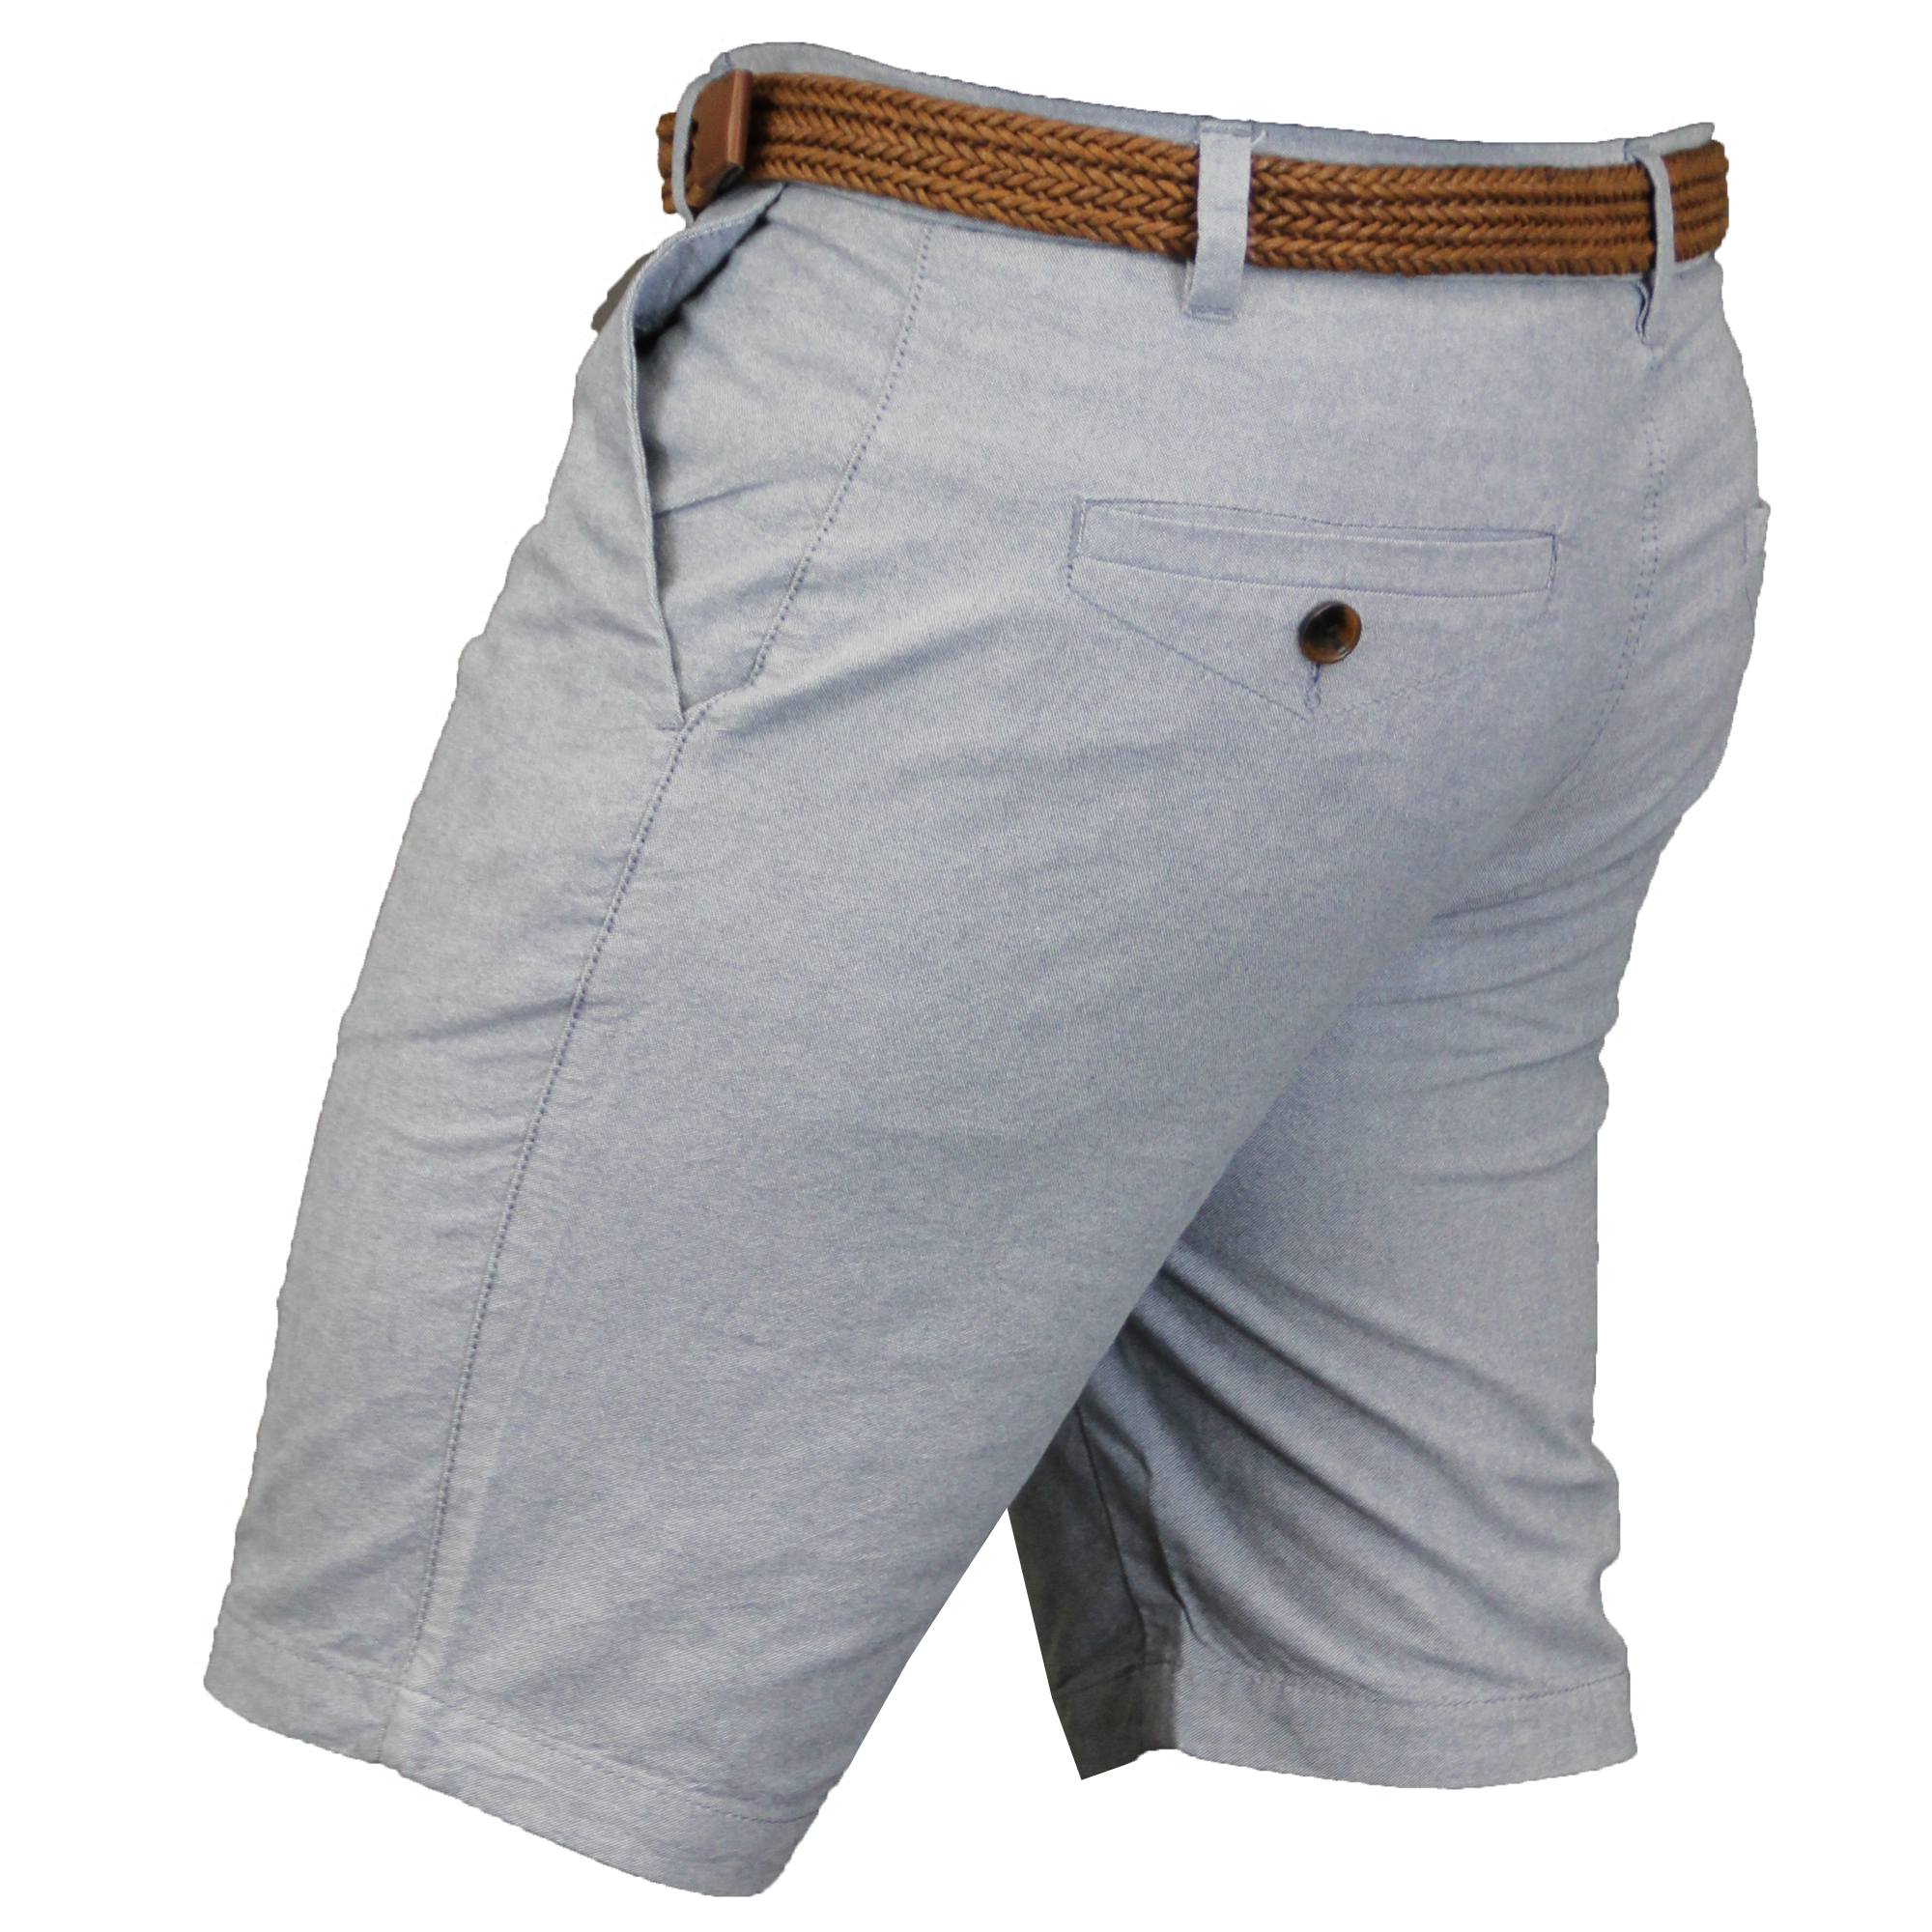 Mens-Cotton-Oxford-Chino-Shorts-Threadbare-Belted-Pants-Knee-Length-Summer-New thumbnail 4